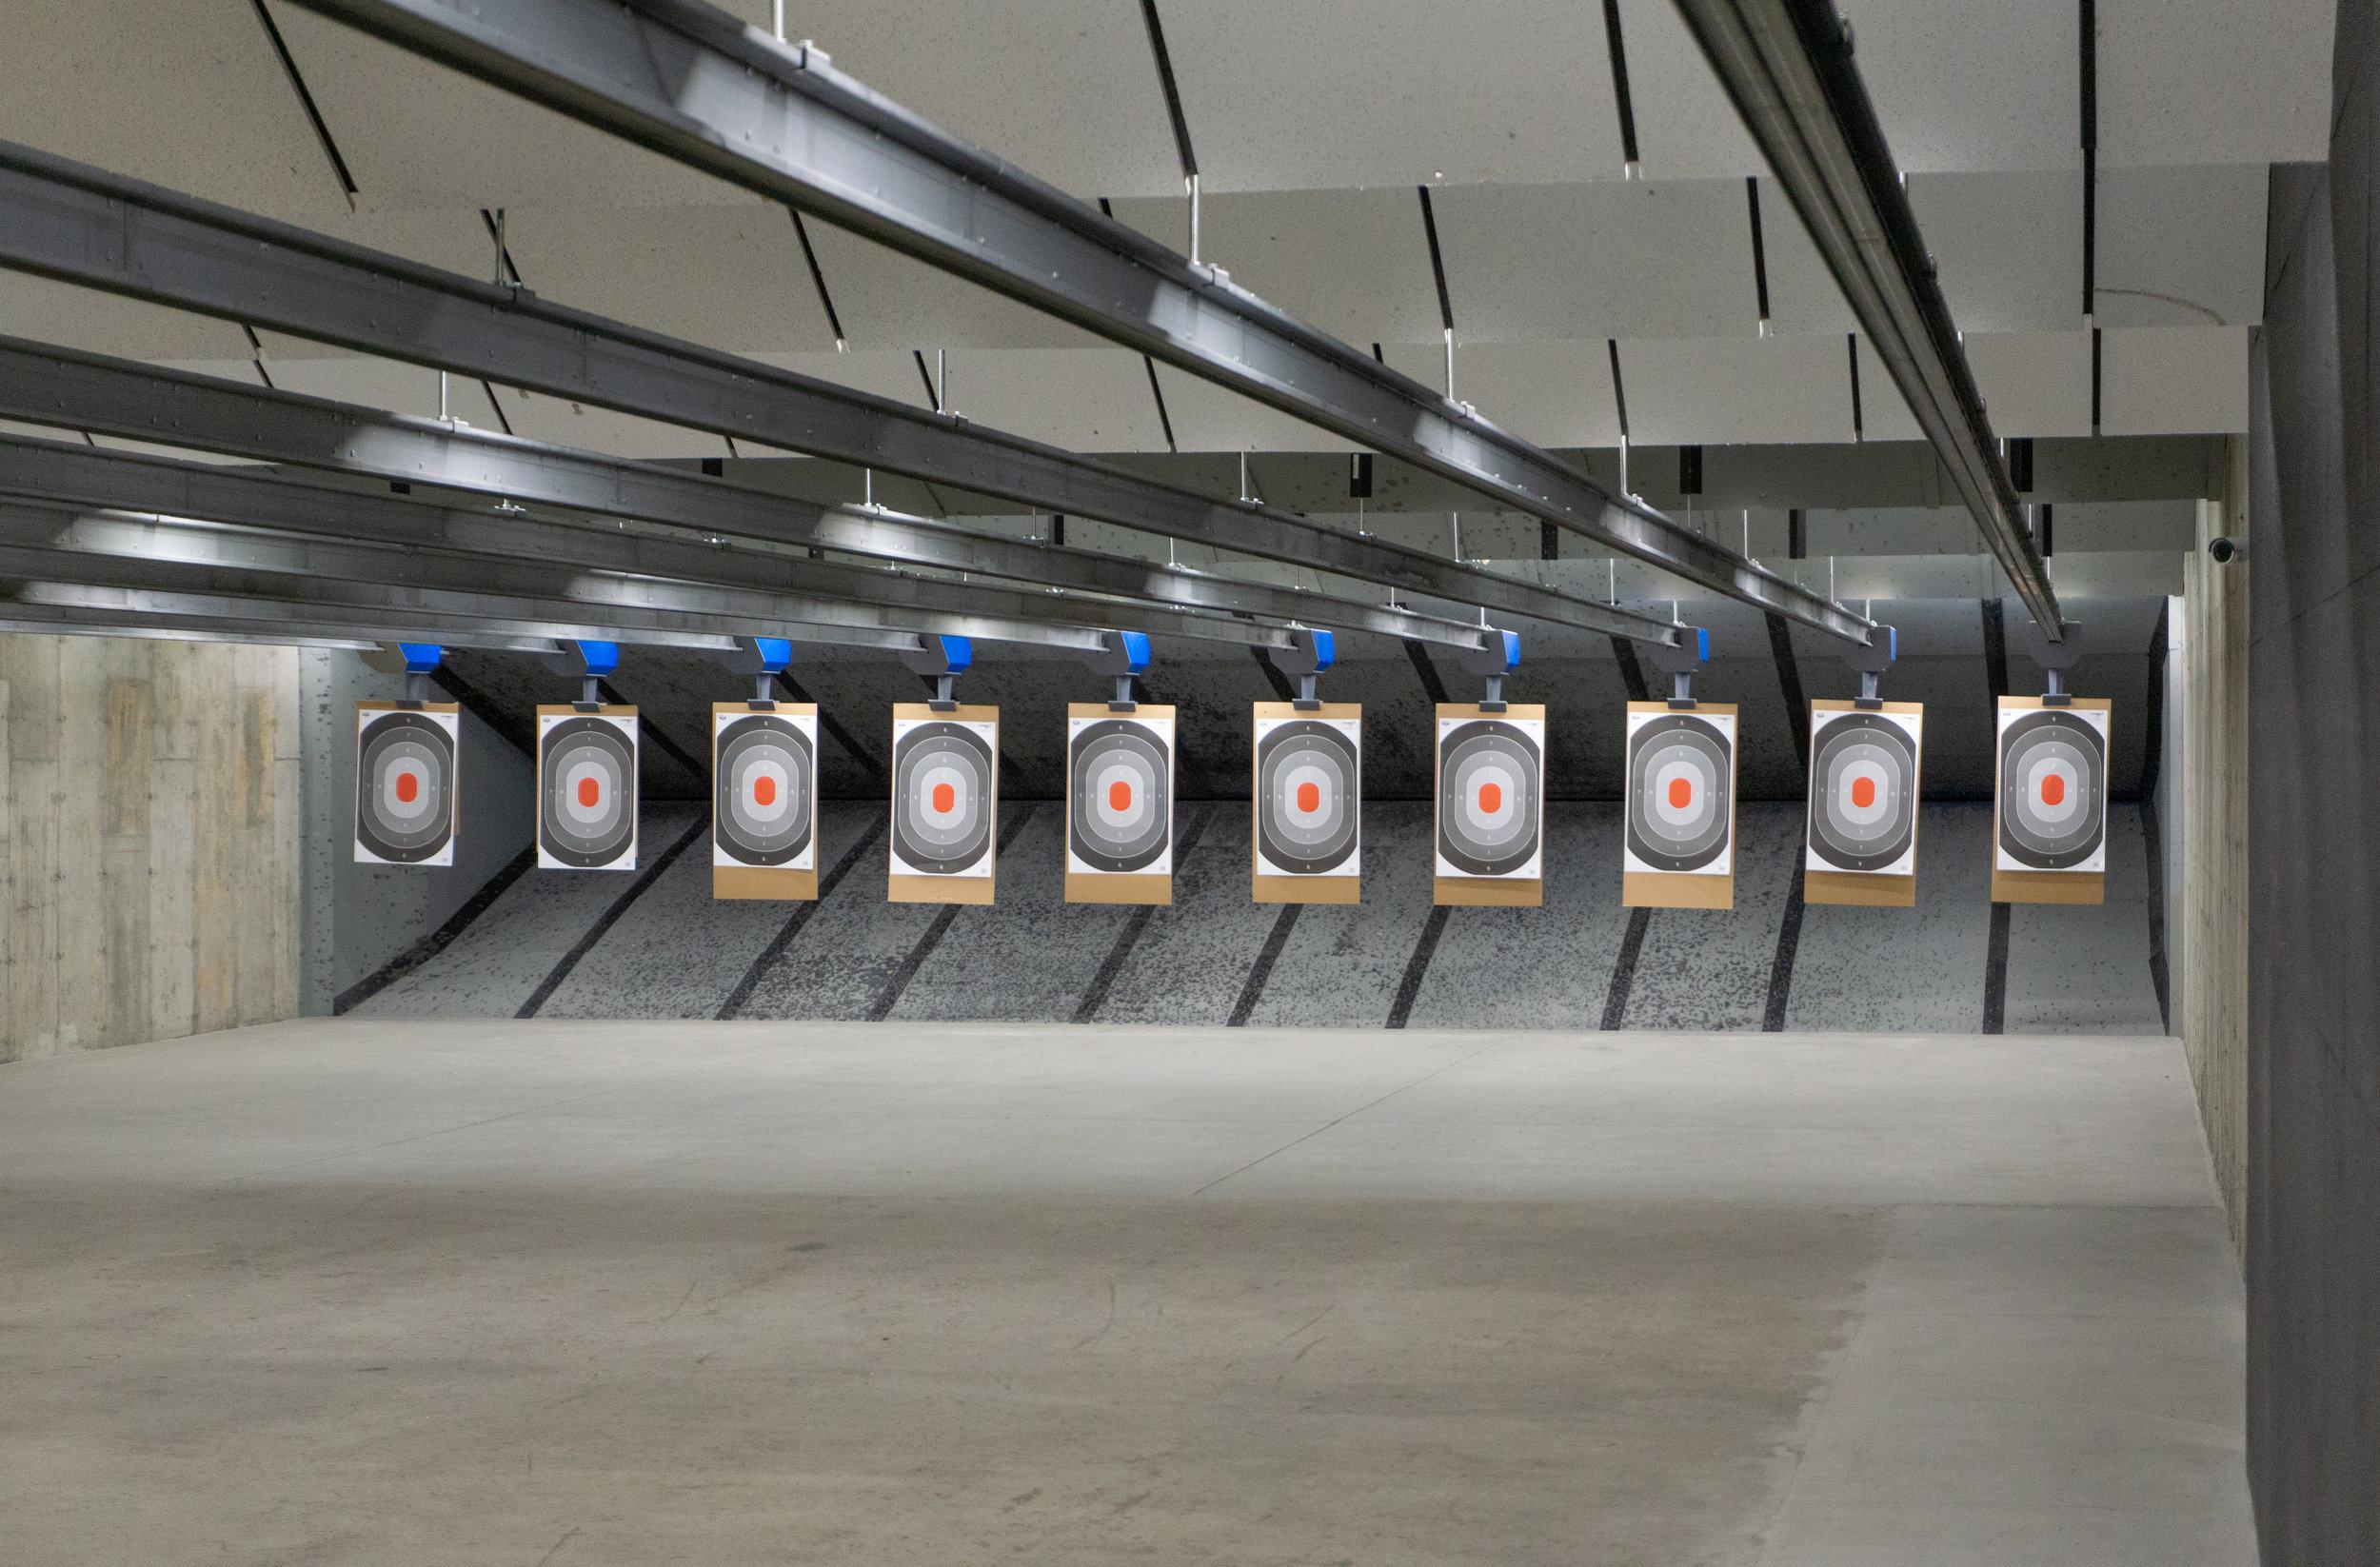 Hot Brass Firearm and Bow Range